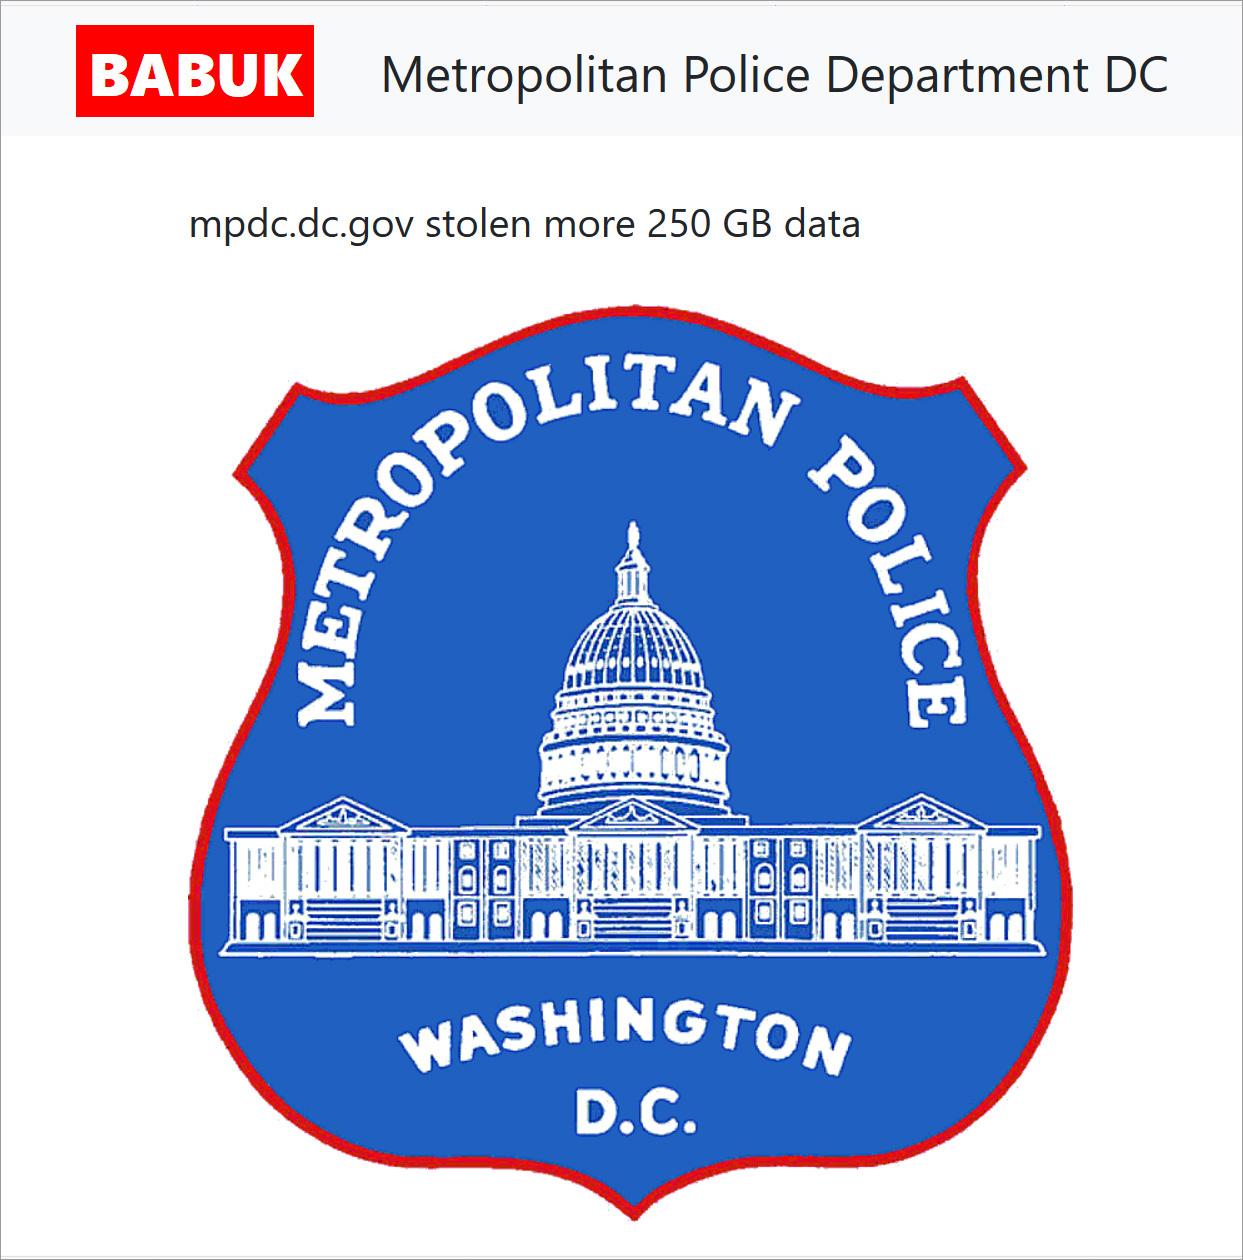 Babuk data leak page for the Metropolitan Police Department